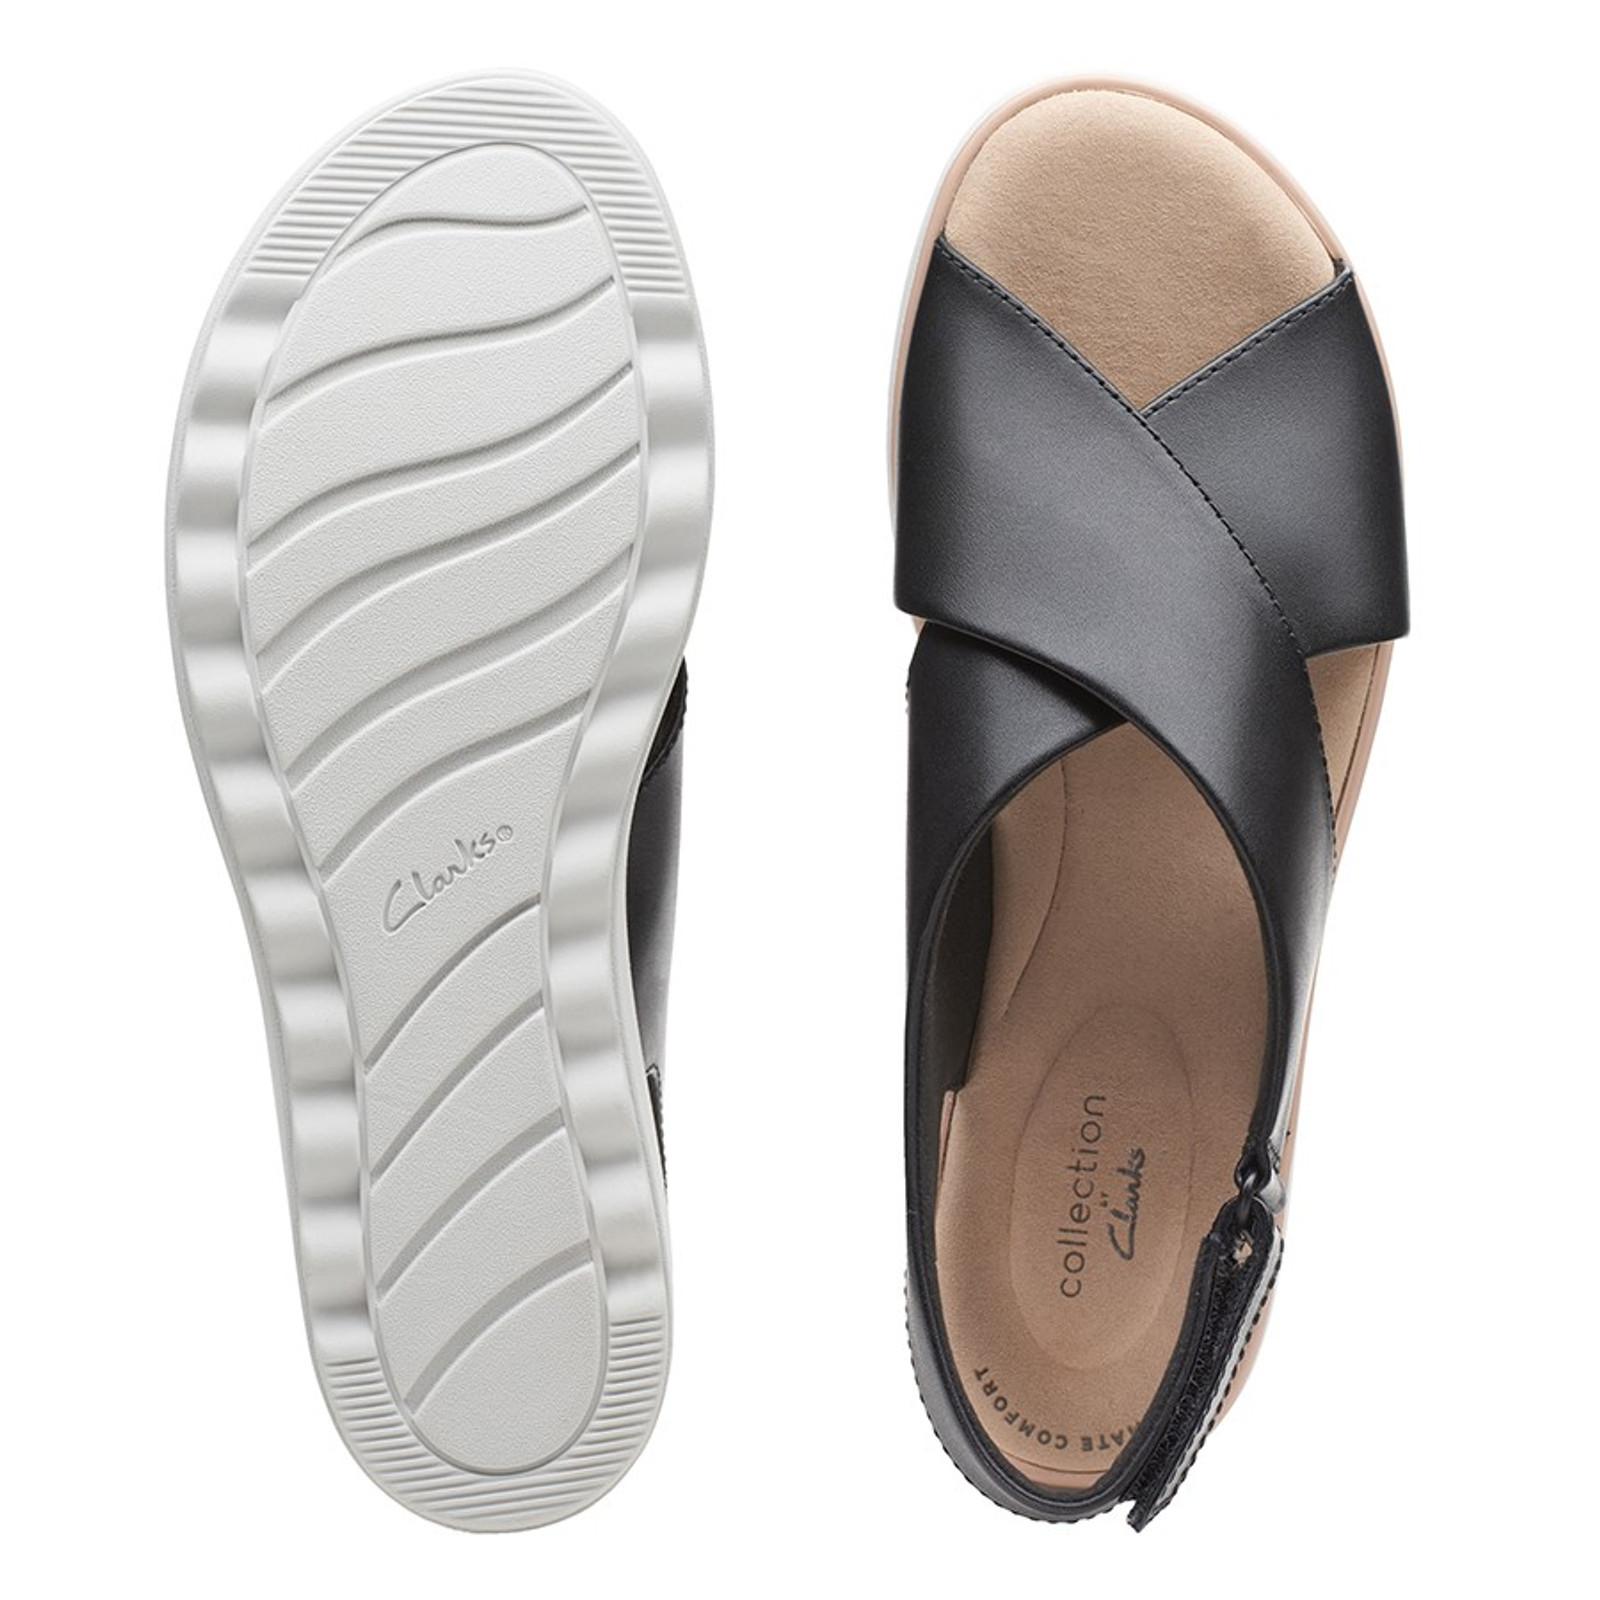 Clarks Womens JILLIAN JEWEL Black Leather/Textile Combo